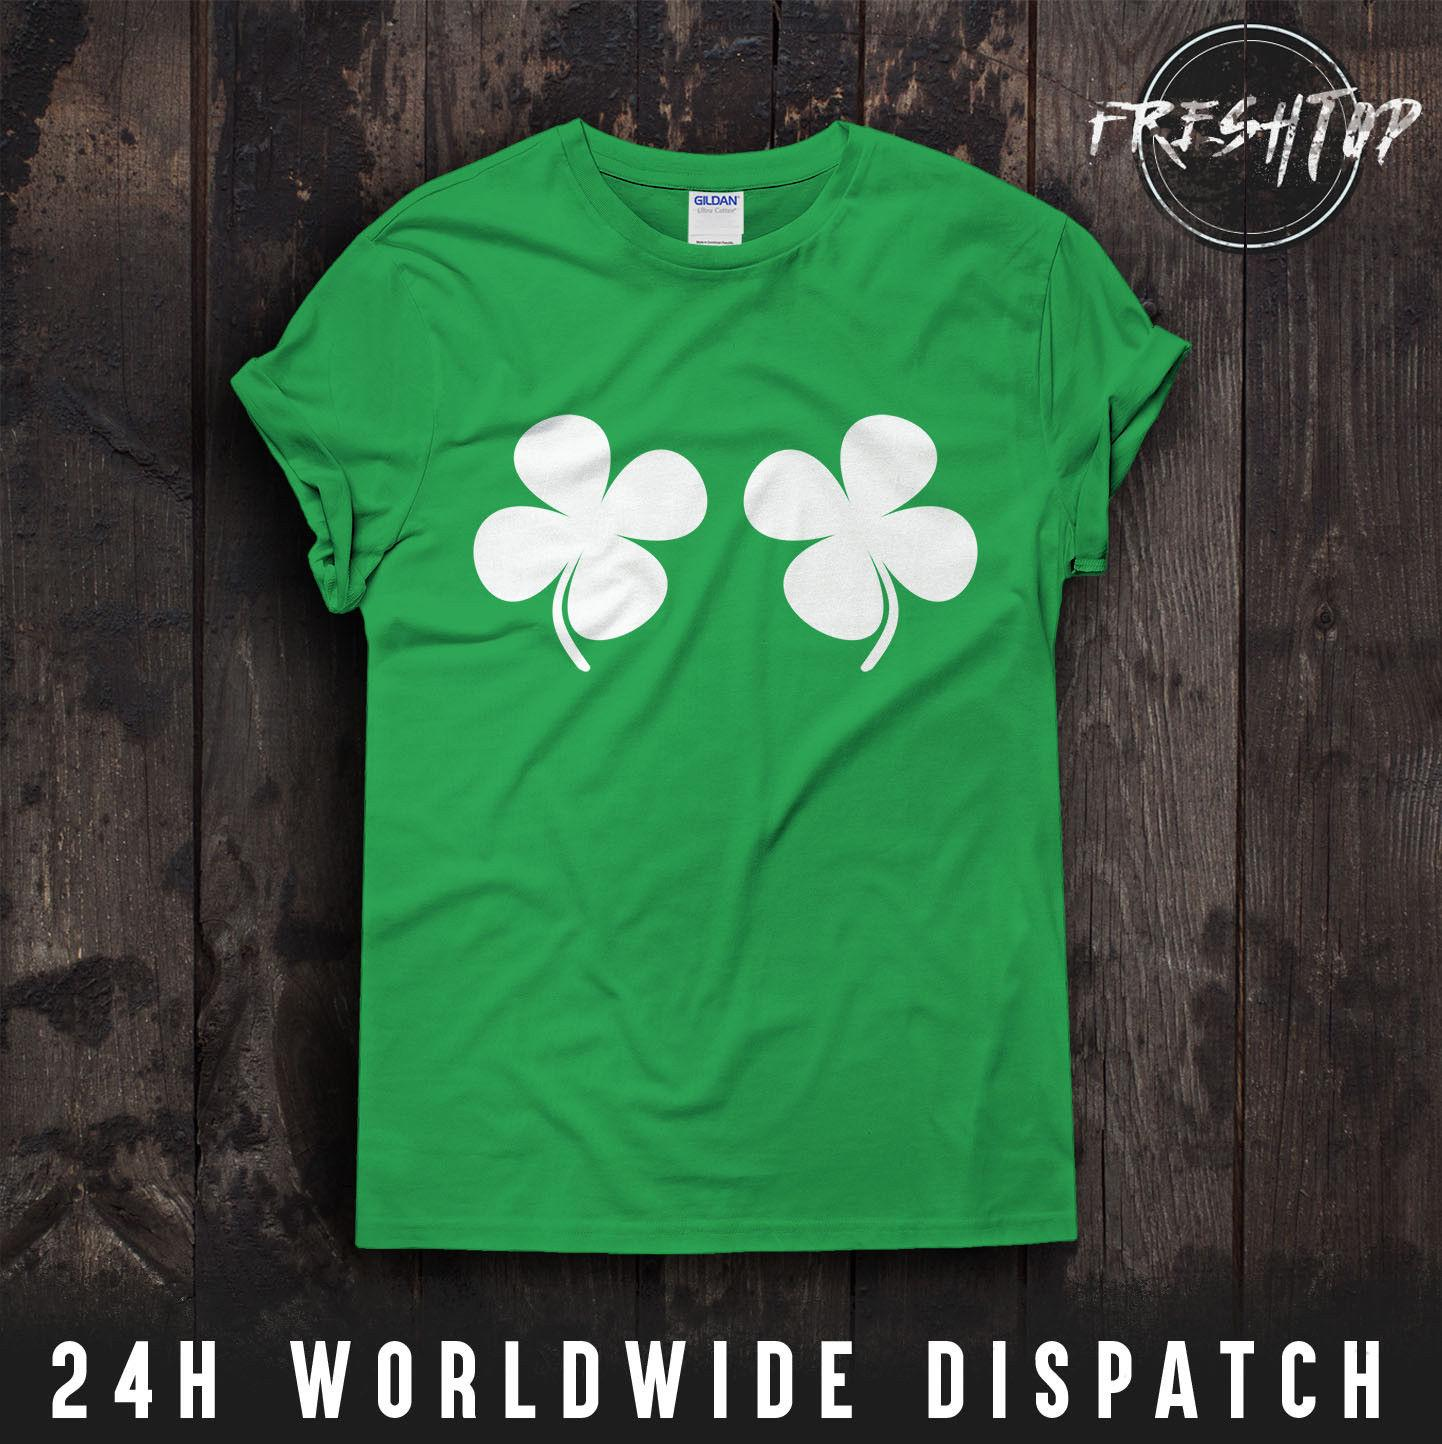 43b971a6b Titties Shamrock T Shirt Ireland Clover Boobs Hen Night Party St Patricks  DayFunny Unisex Casual Gift Tee Shirt Shop Online One T Shirt A Day From ...